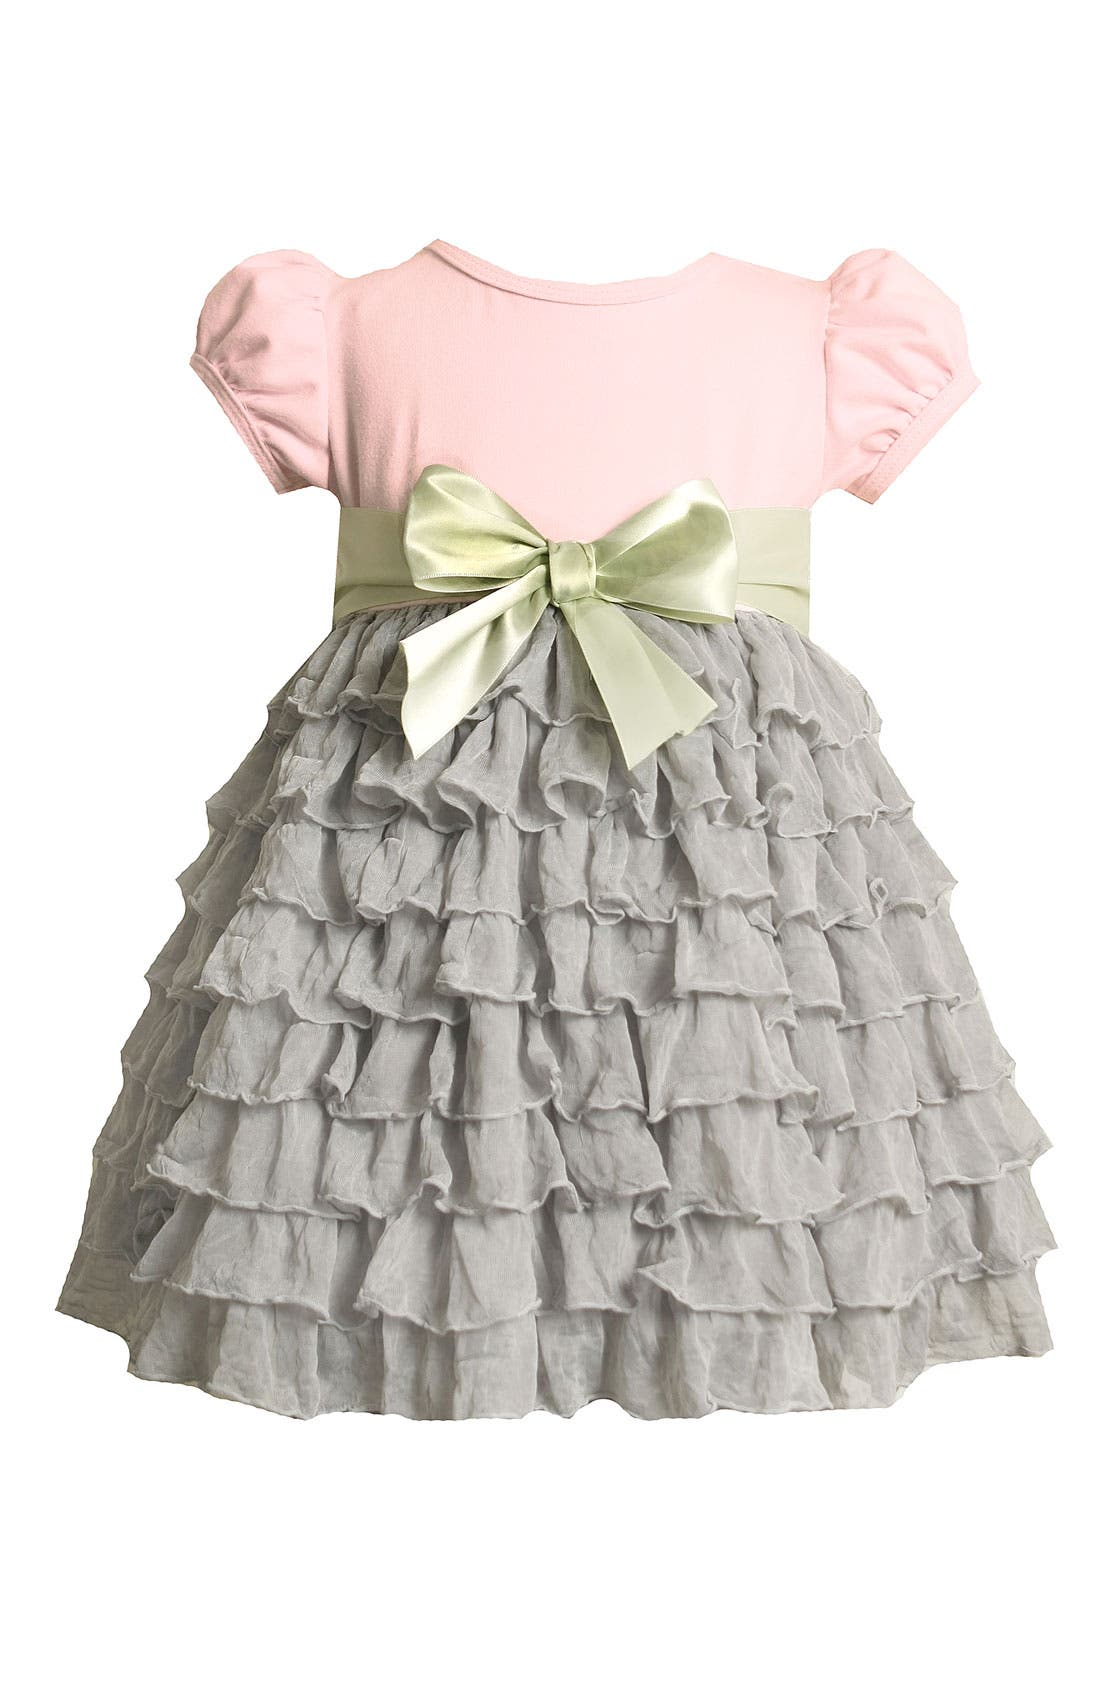 Alternate Image 1 Selected - Iris & Ivy Tiered Dress (Toddler)